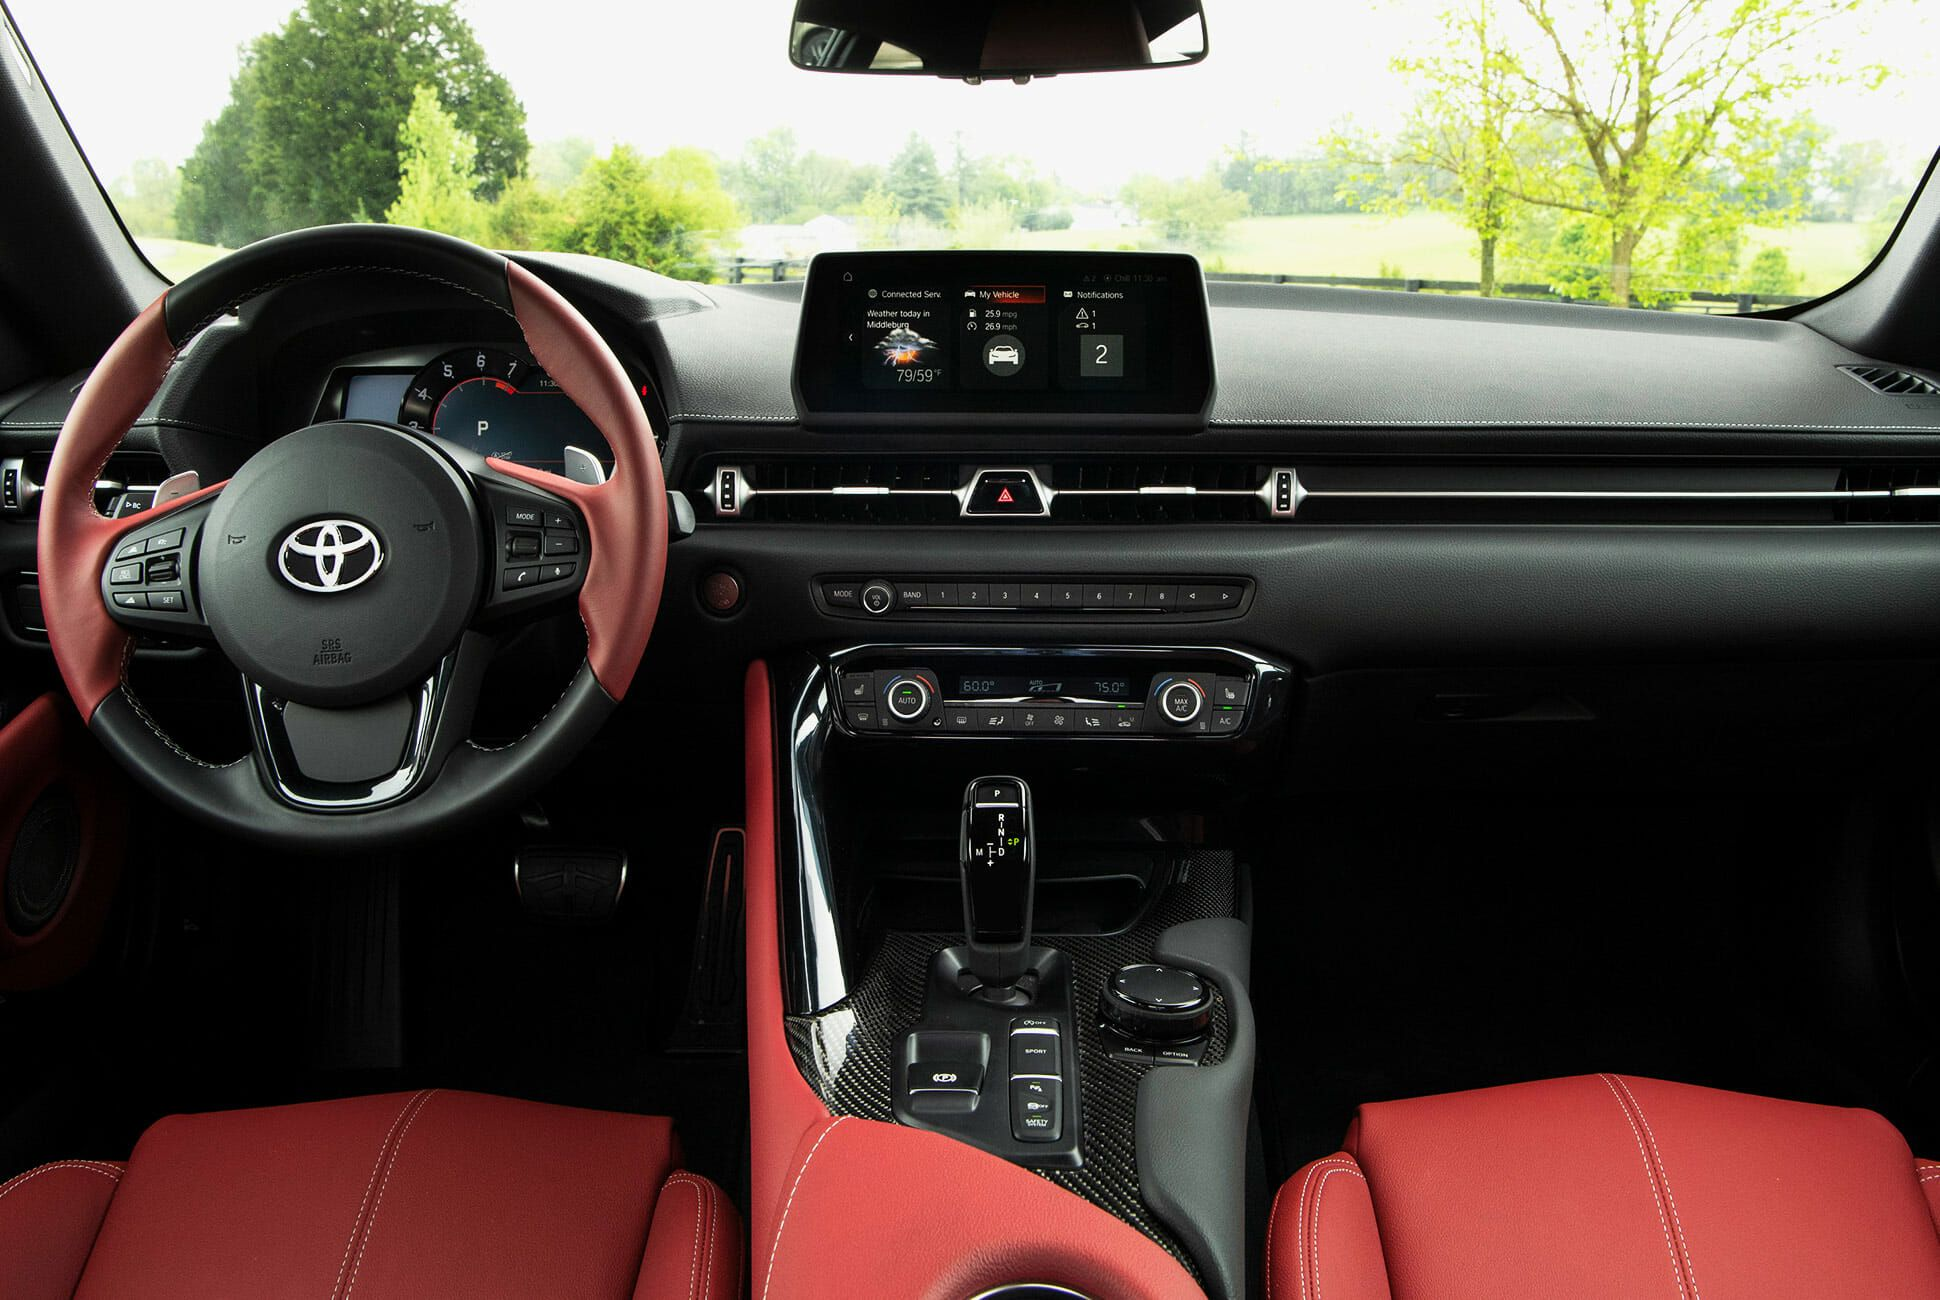 2020-Toyota-Supra-Gr-Review-gear-patrol-slide-4